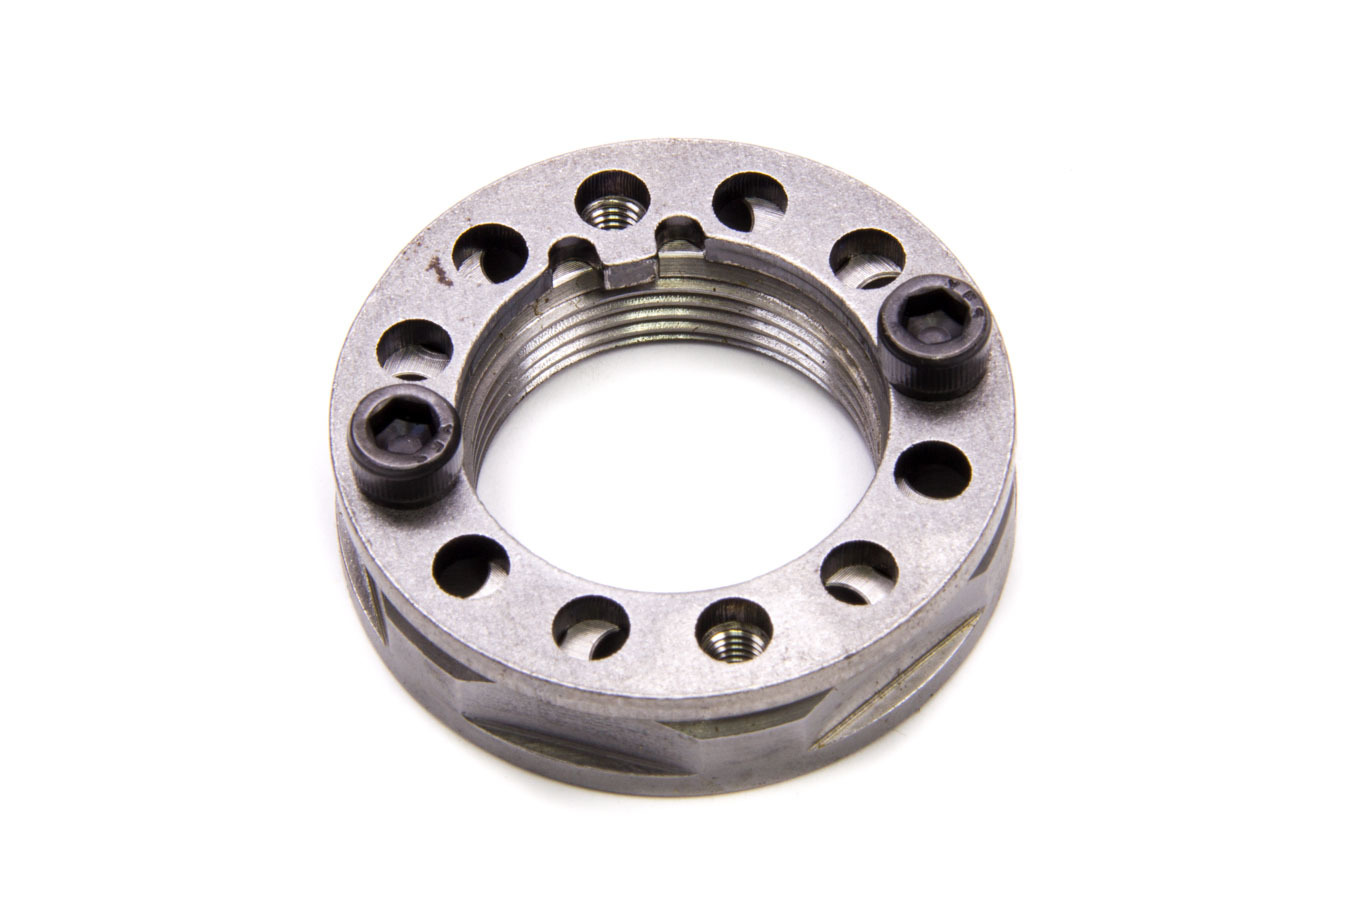 Diversified Machine Steel Spindle Locknut Kit (Trick)